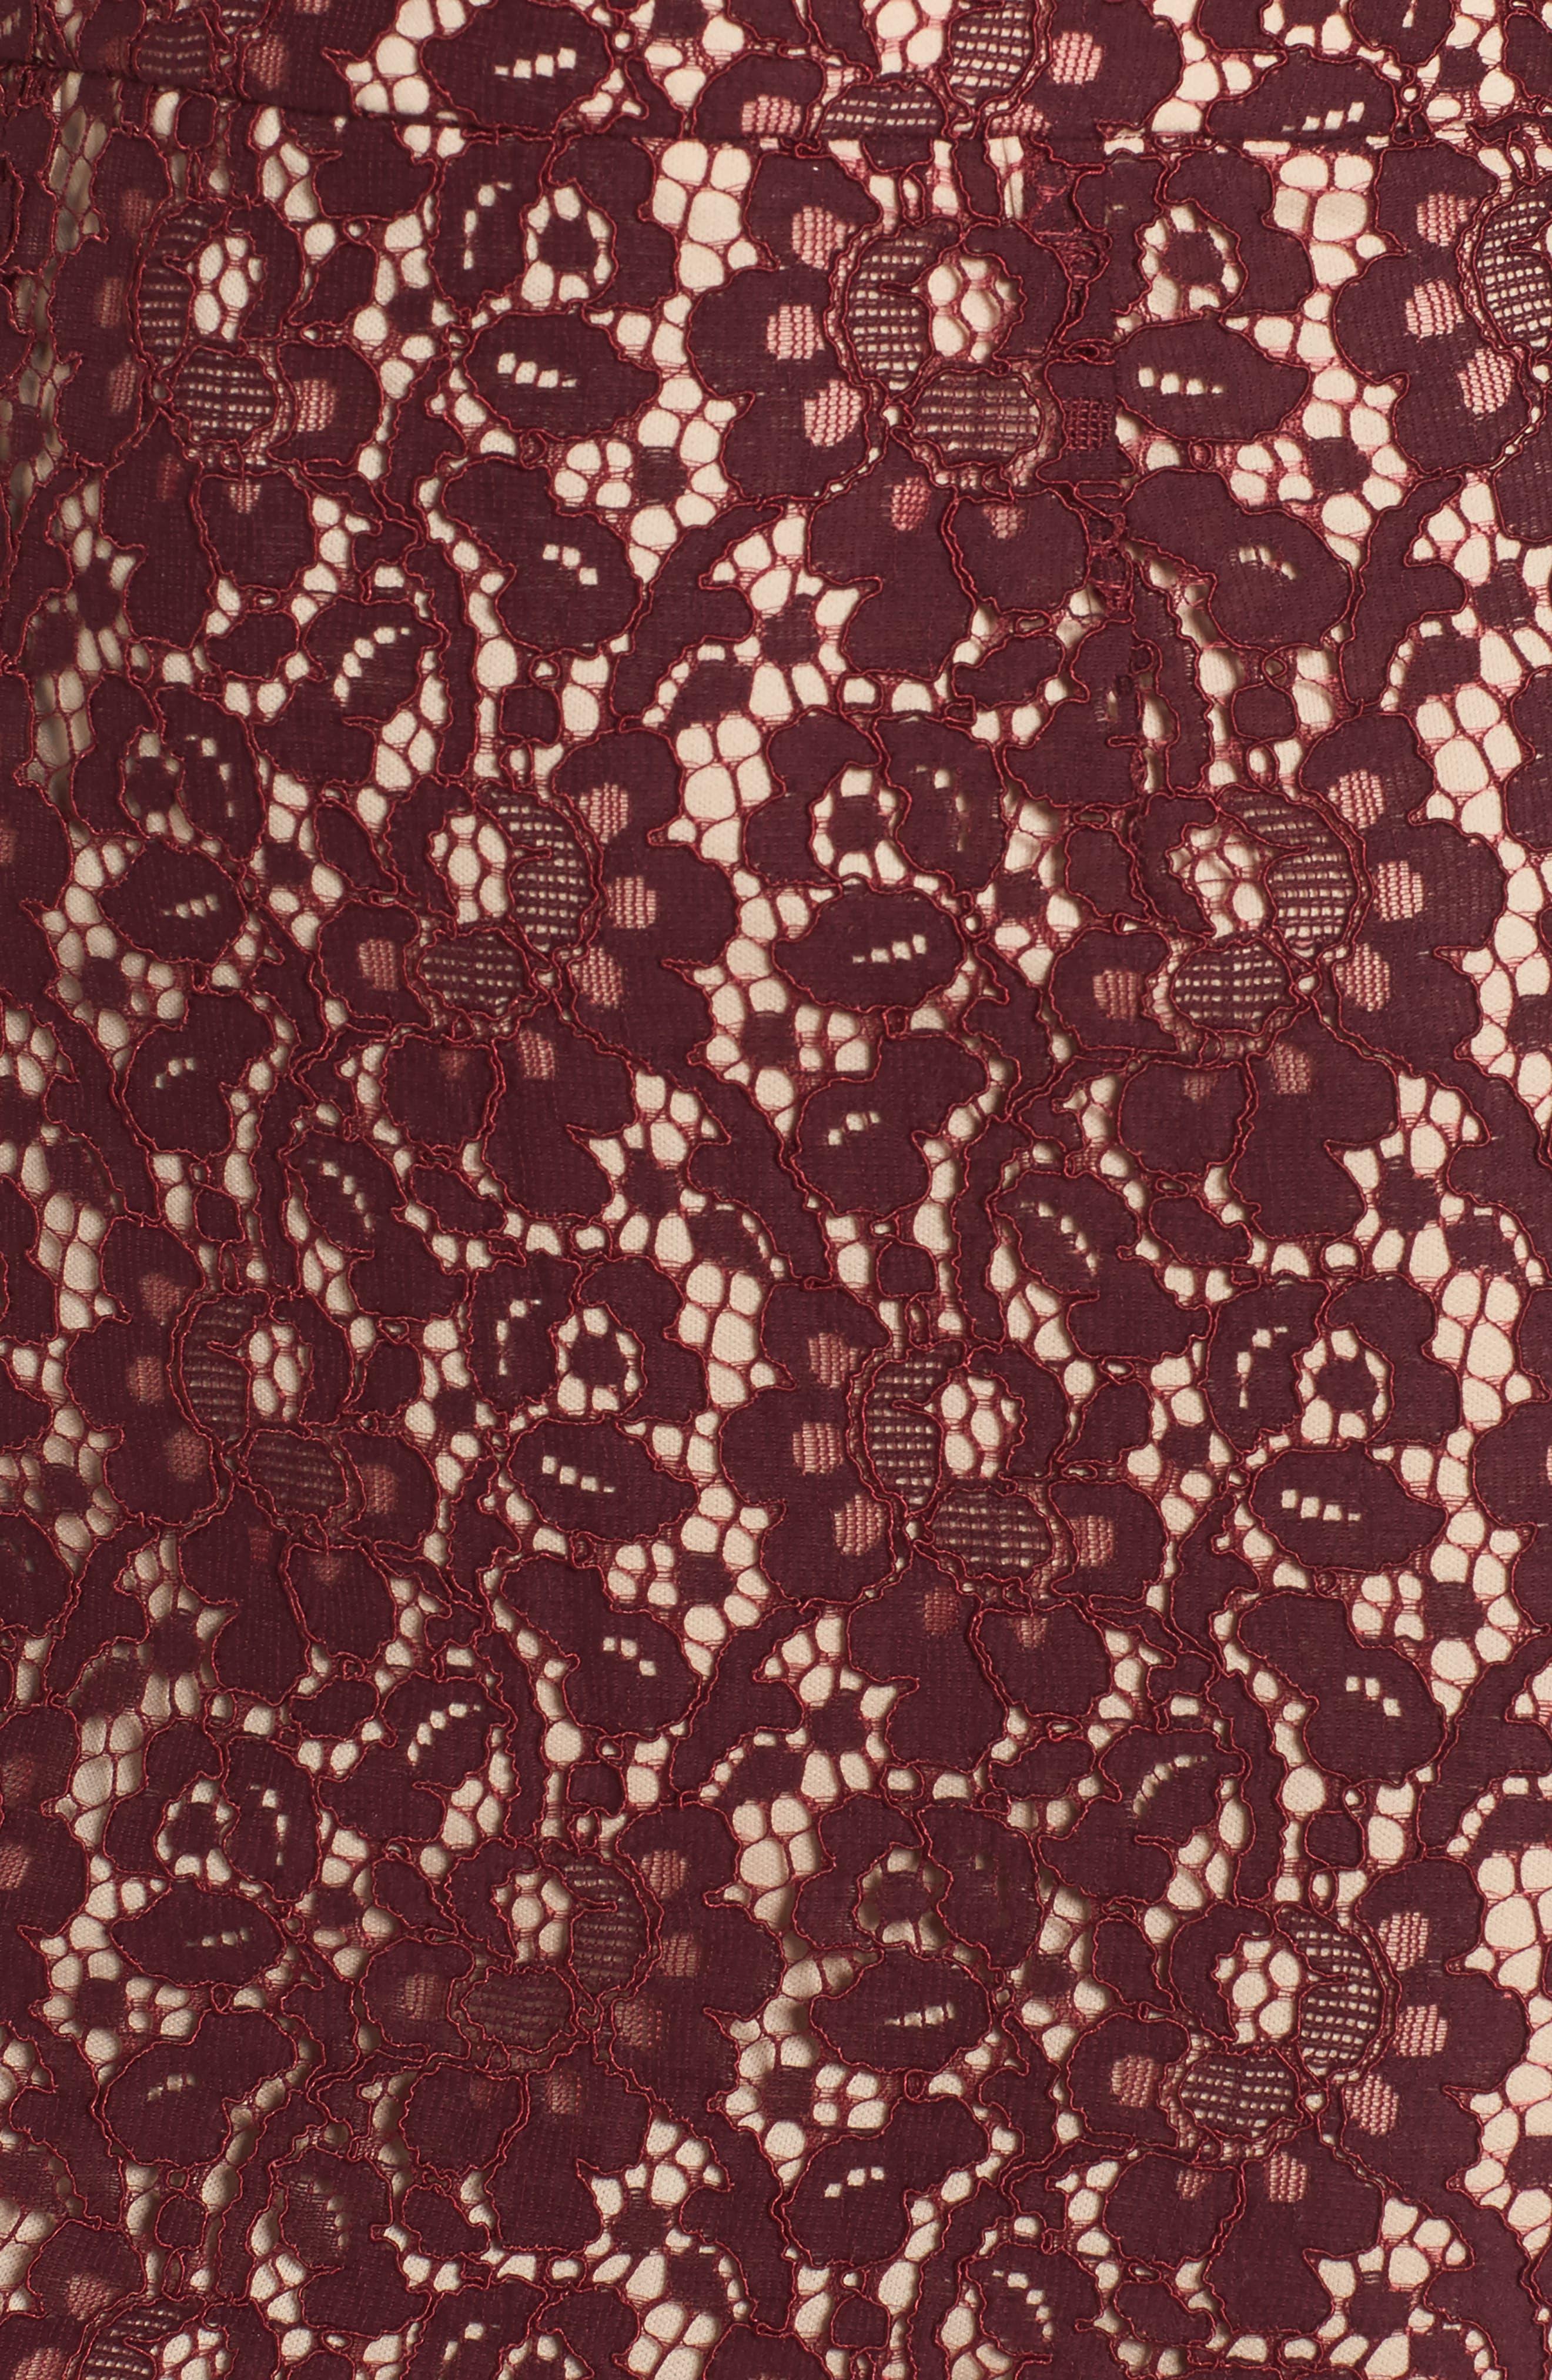 Lace Halter Midi Dress,                             Alternate thumbnail 5, color,                             Wine